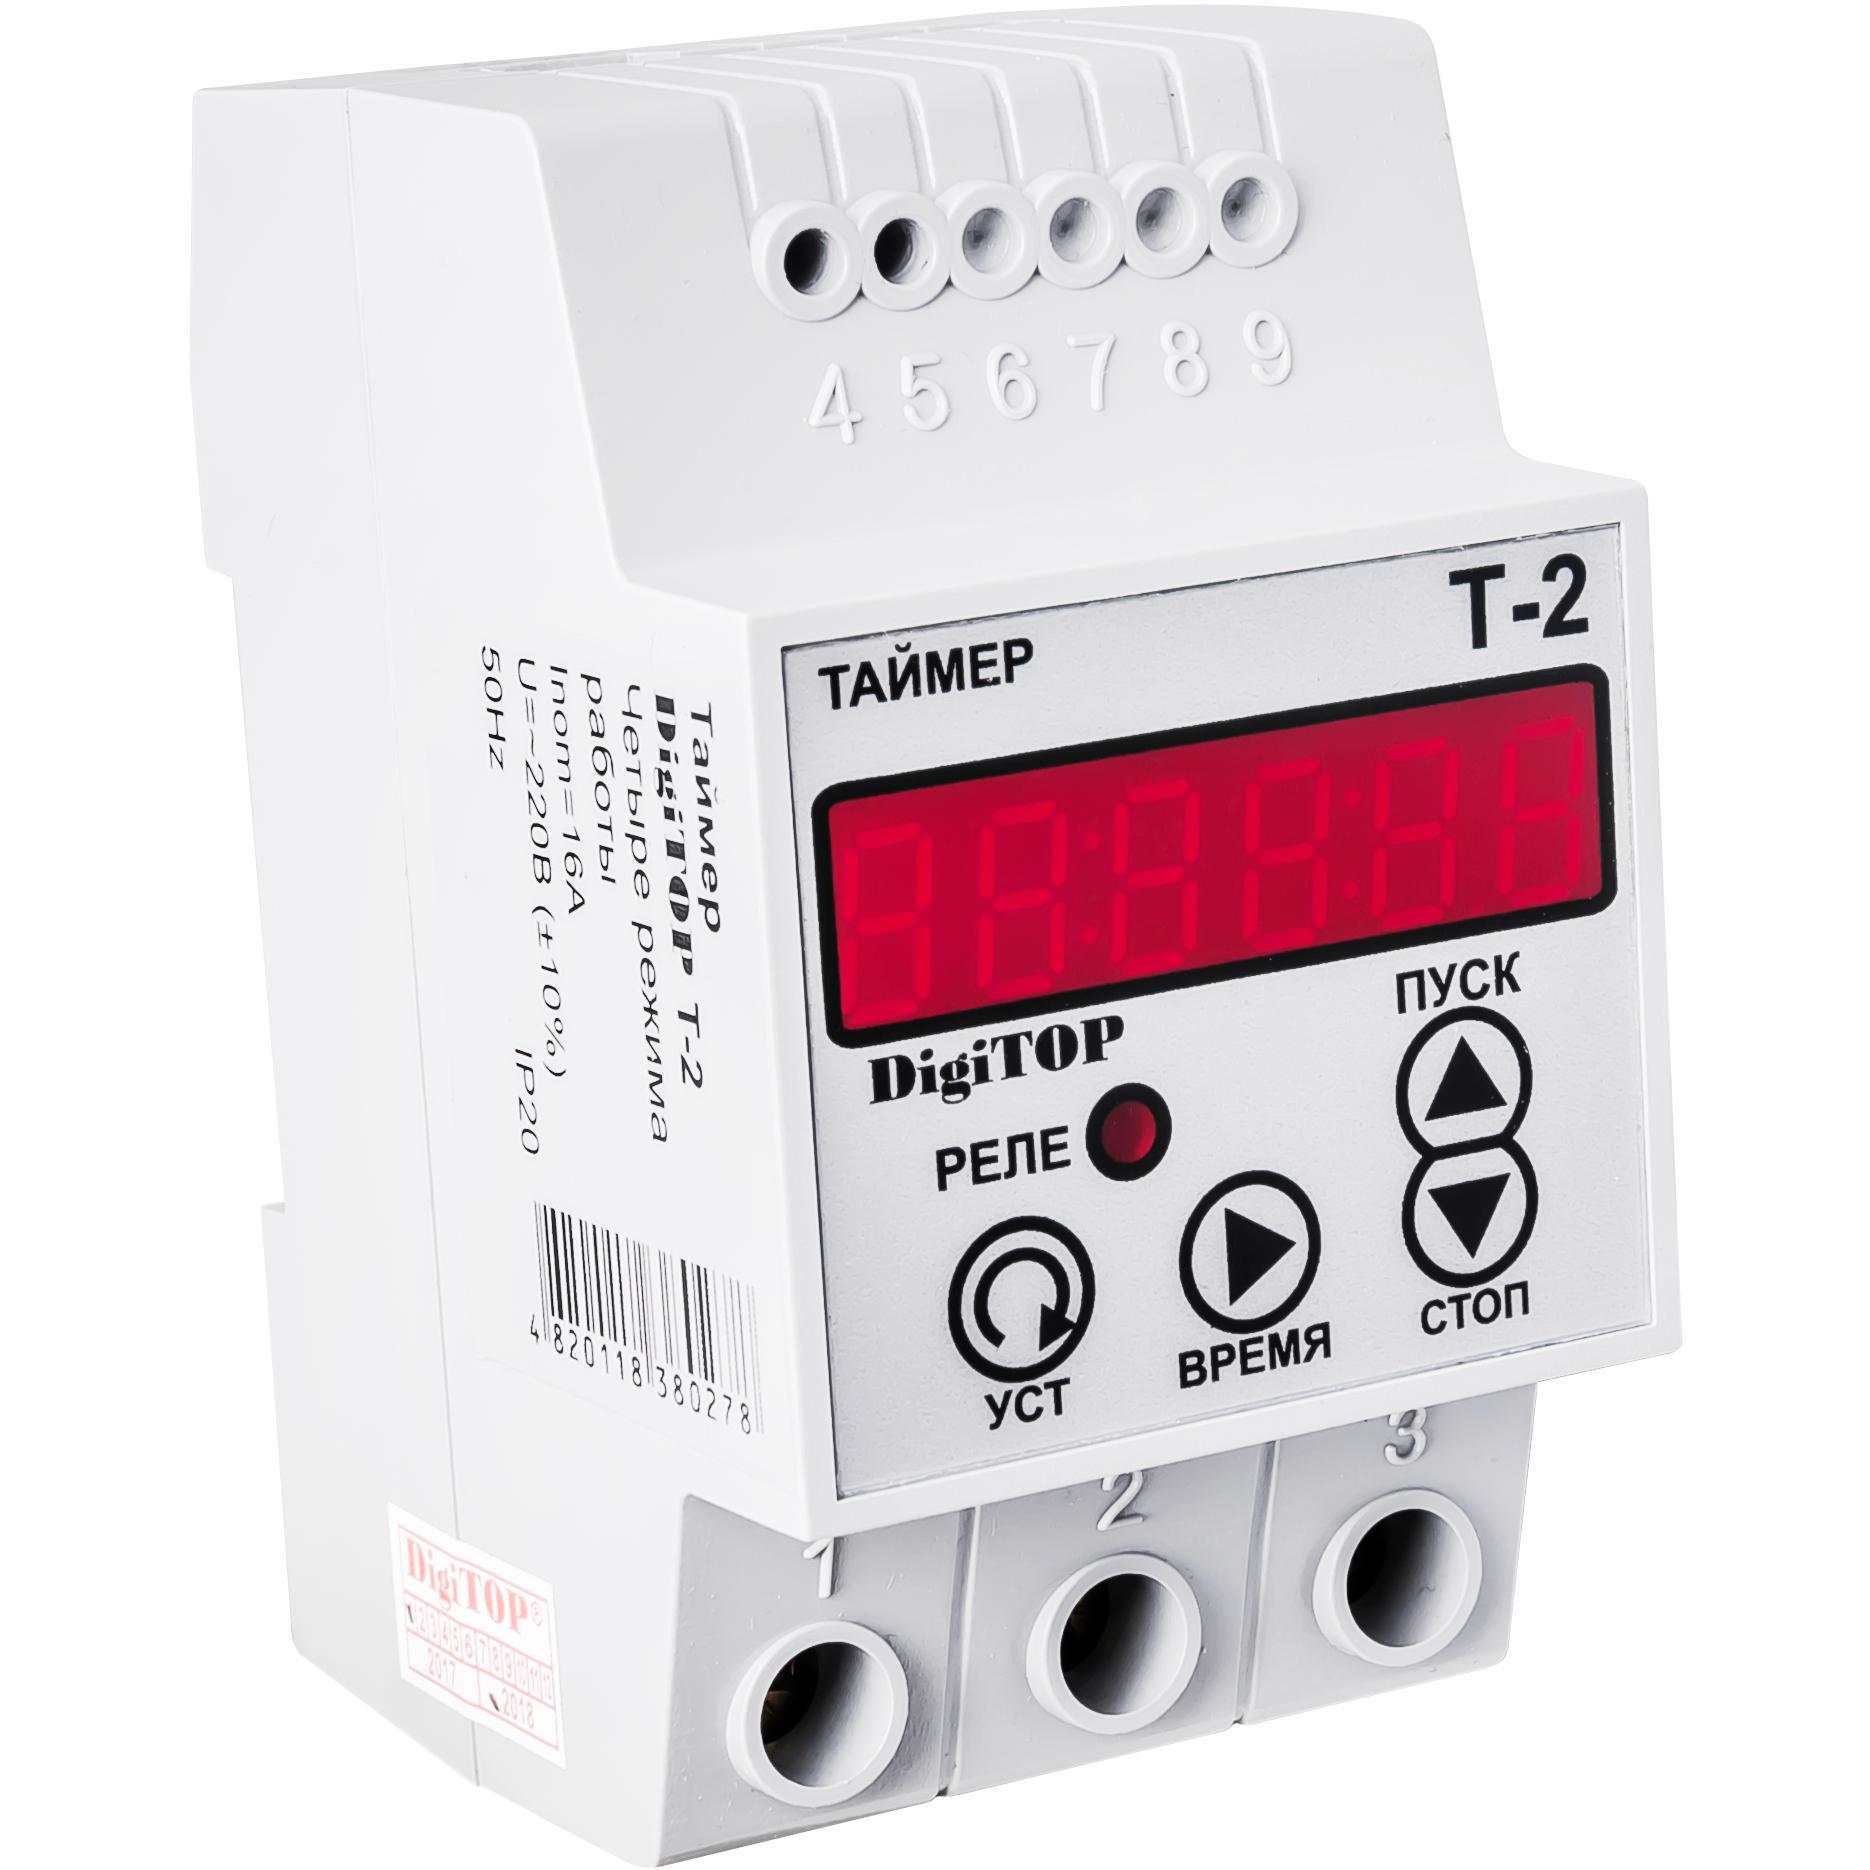 Таймер Digitop Т-2